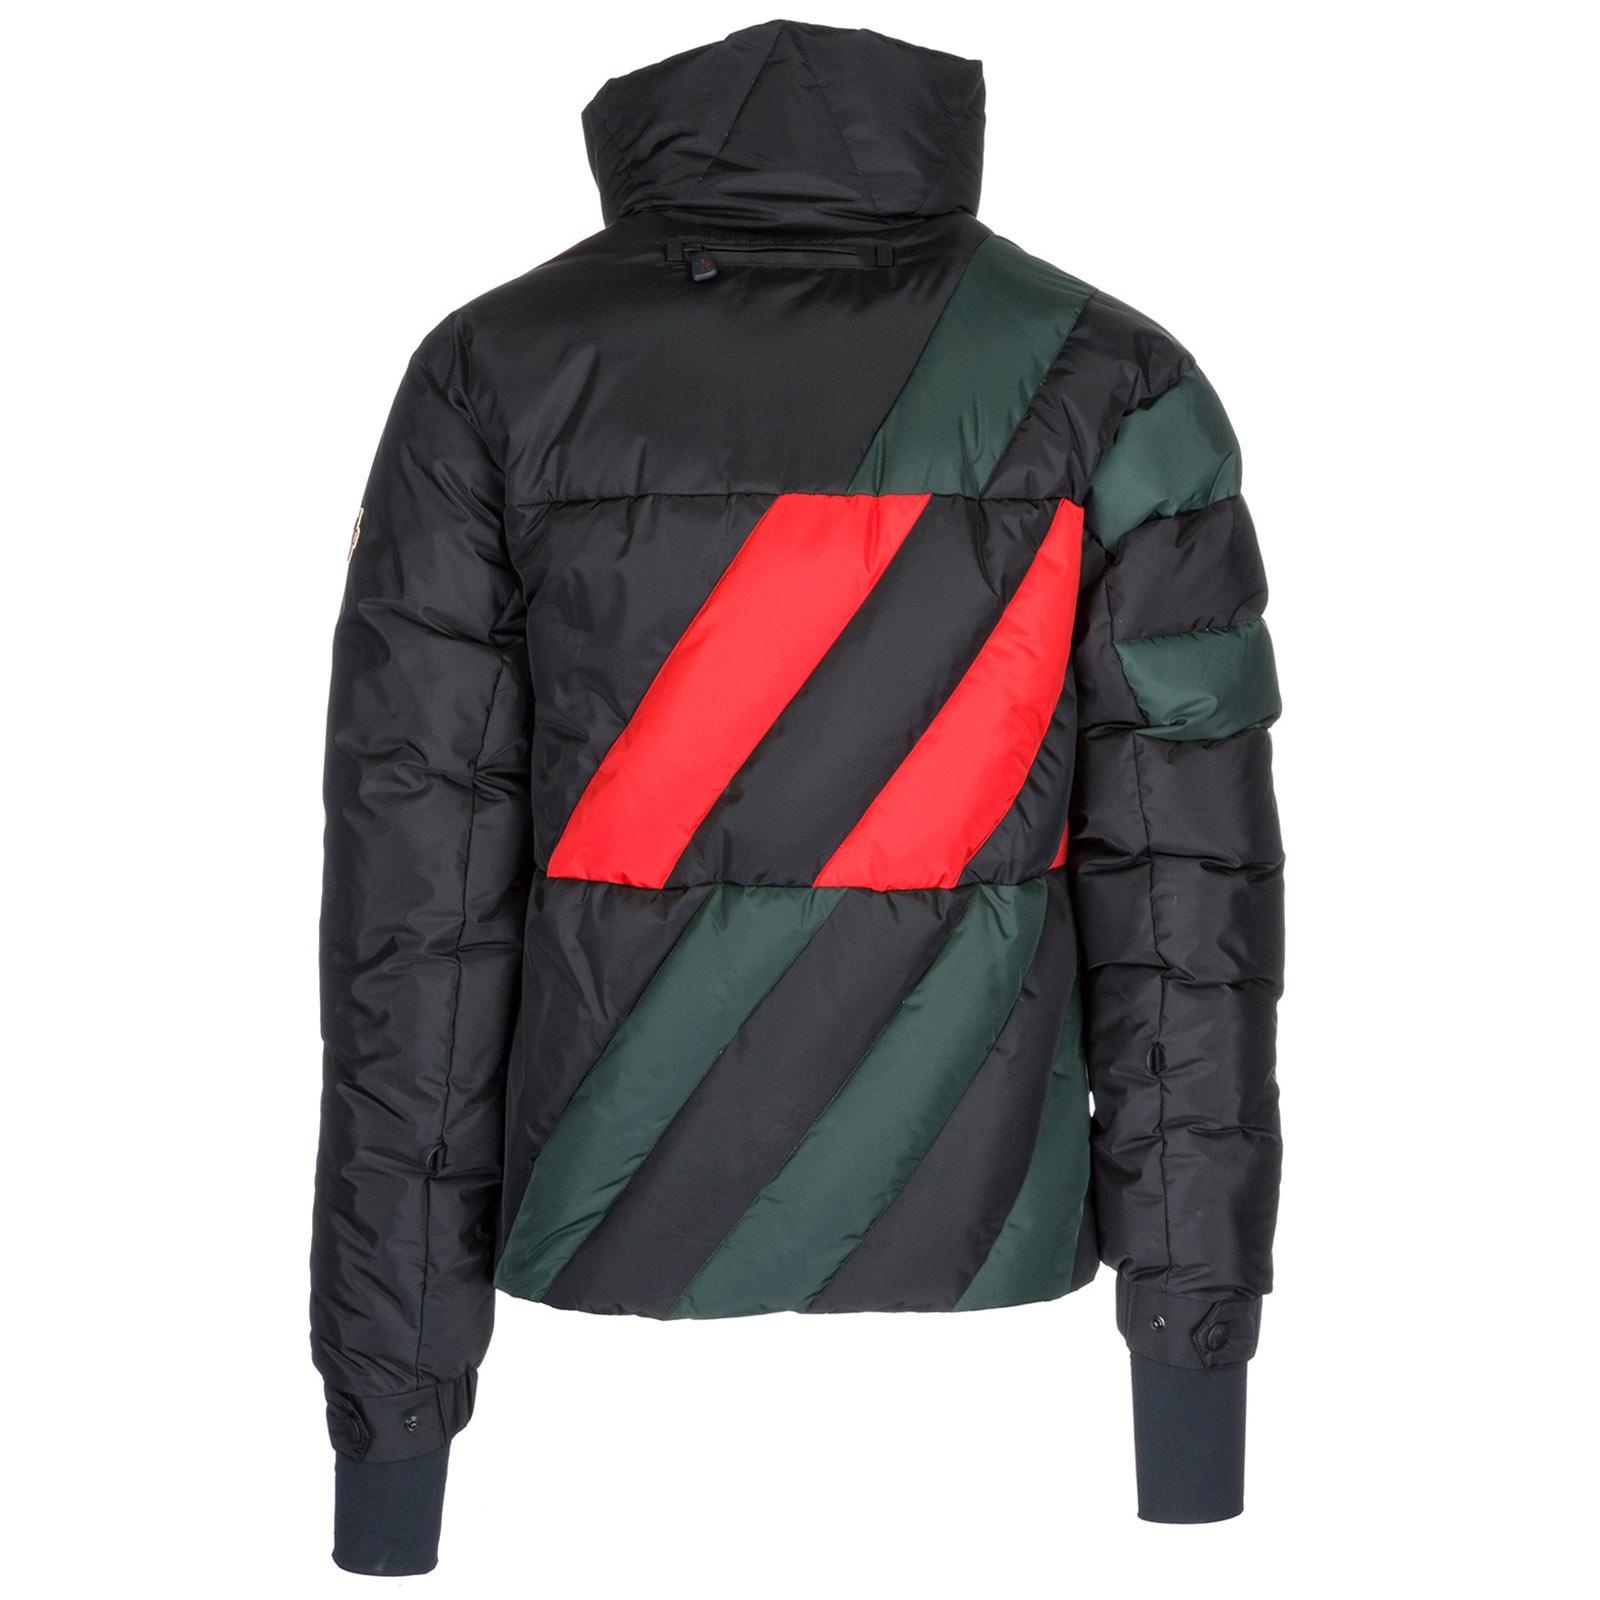 Piumino bomber men's outerwear jacket blouson thorens Piumino bomber men's outerwear jacket blouson thorens ...